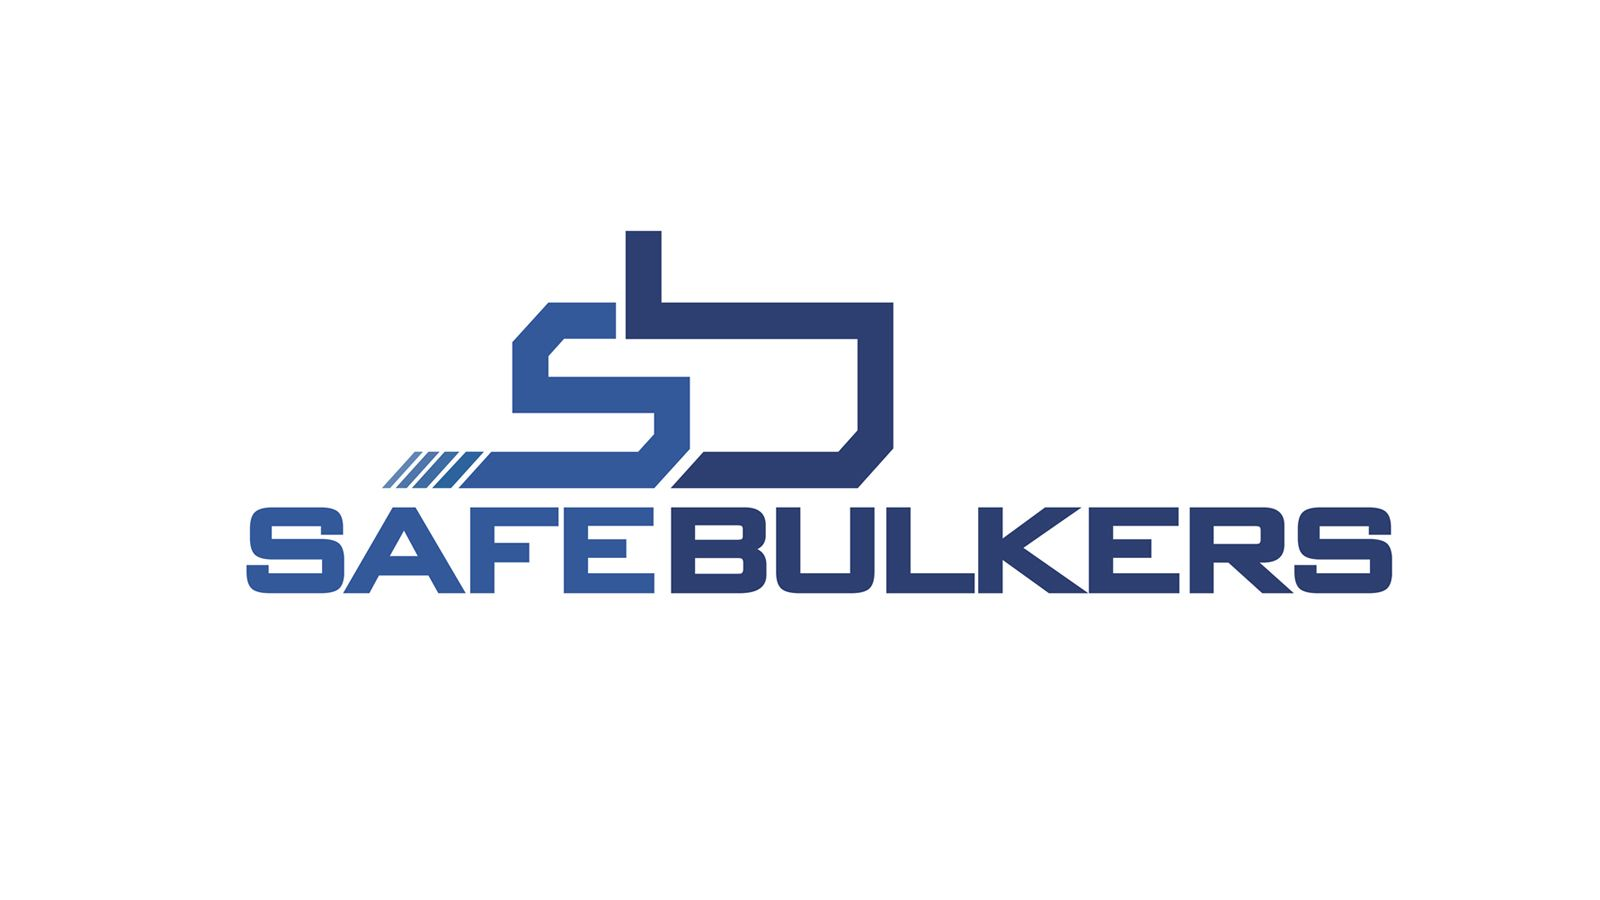 safe bulkers_ an international provider of marine drybulk transportation services